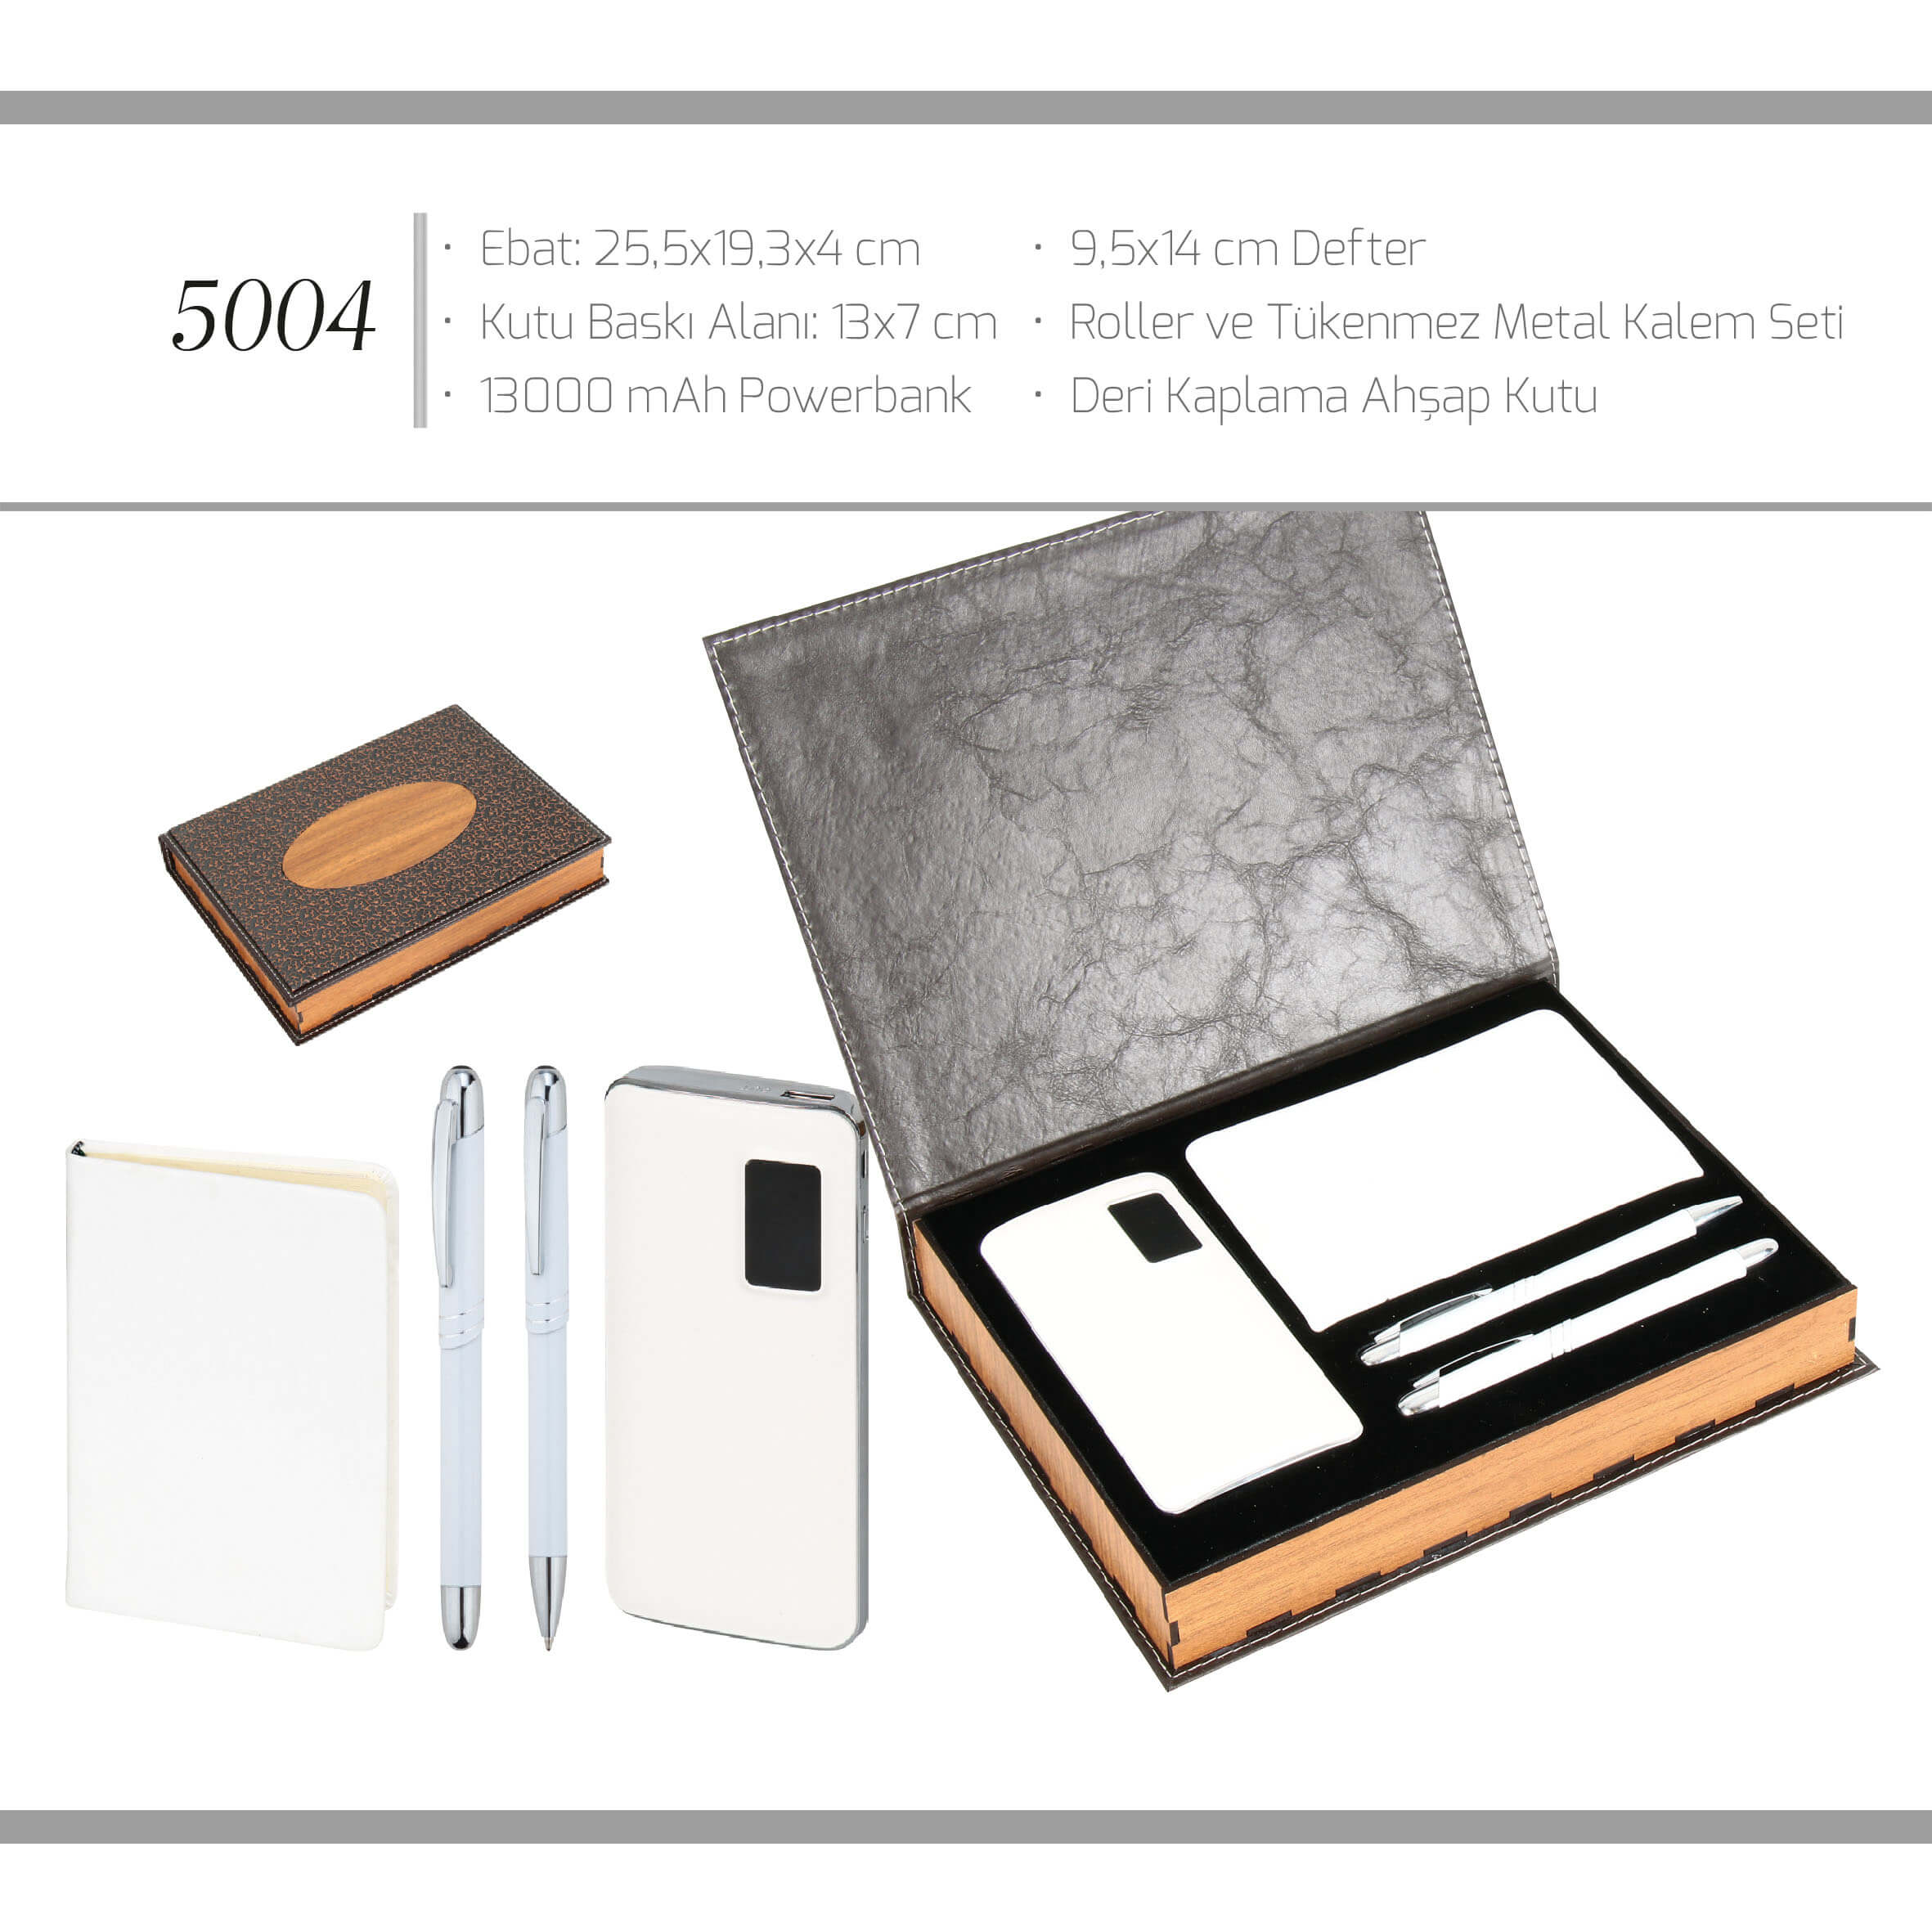 promosyon-promosyon ürünleri-VIP setler-promosyon 5004